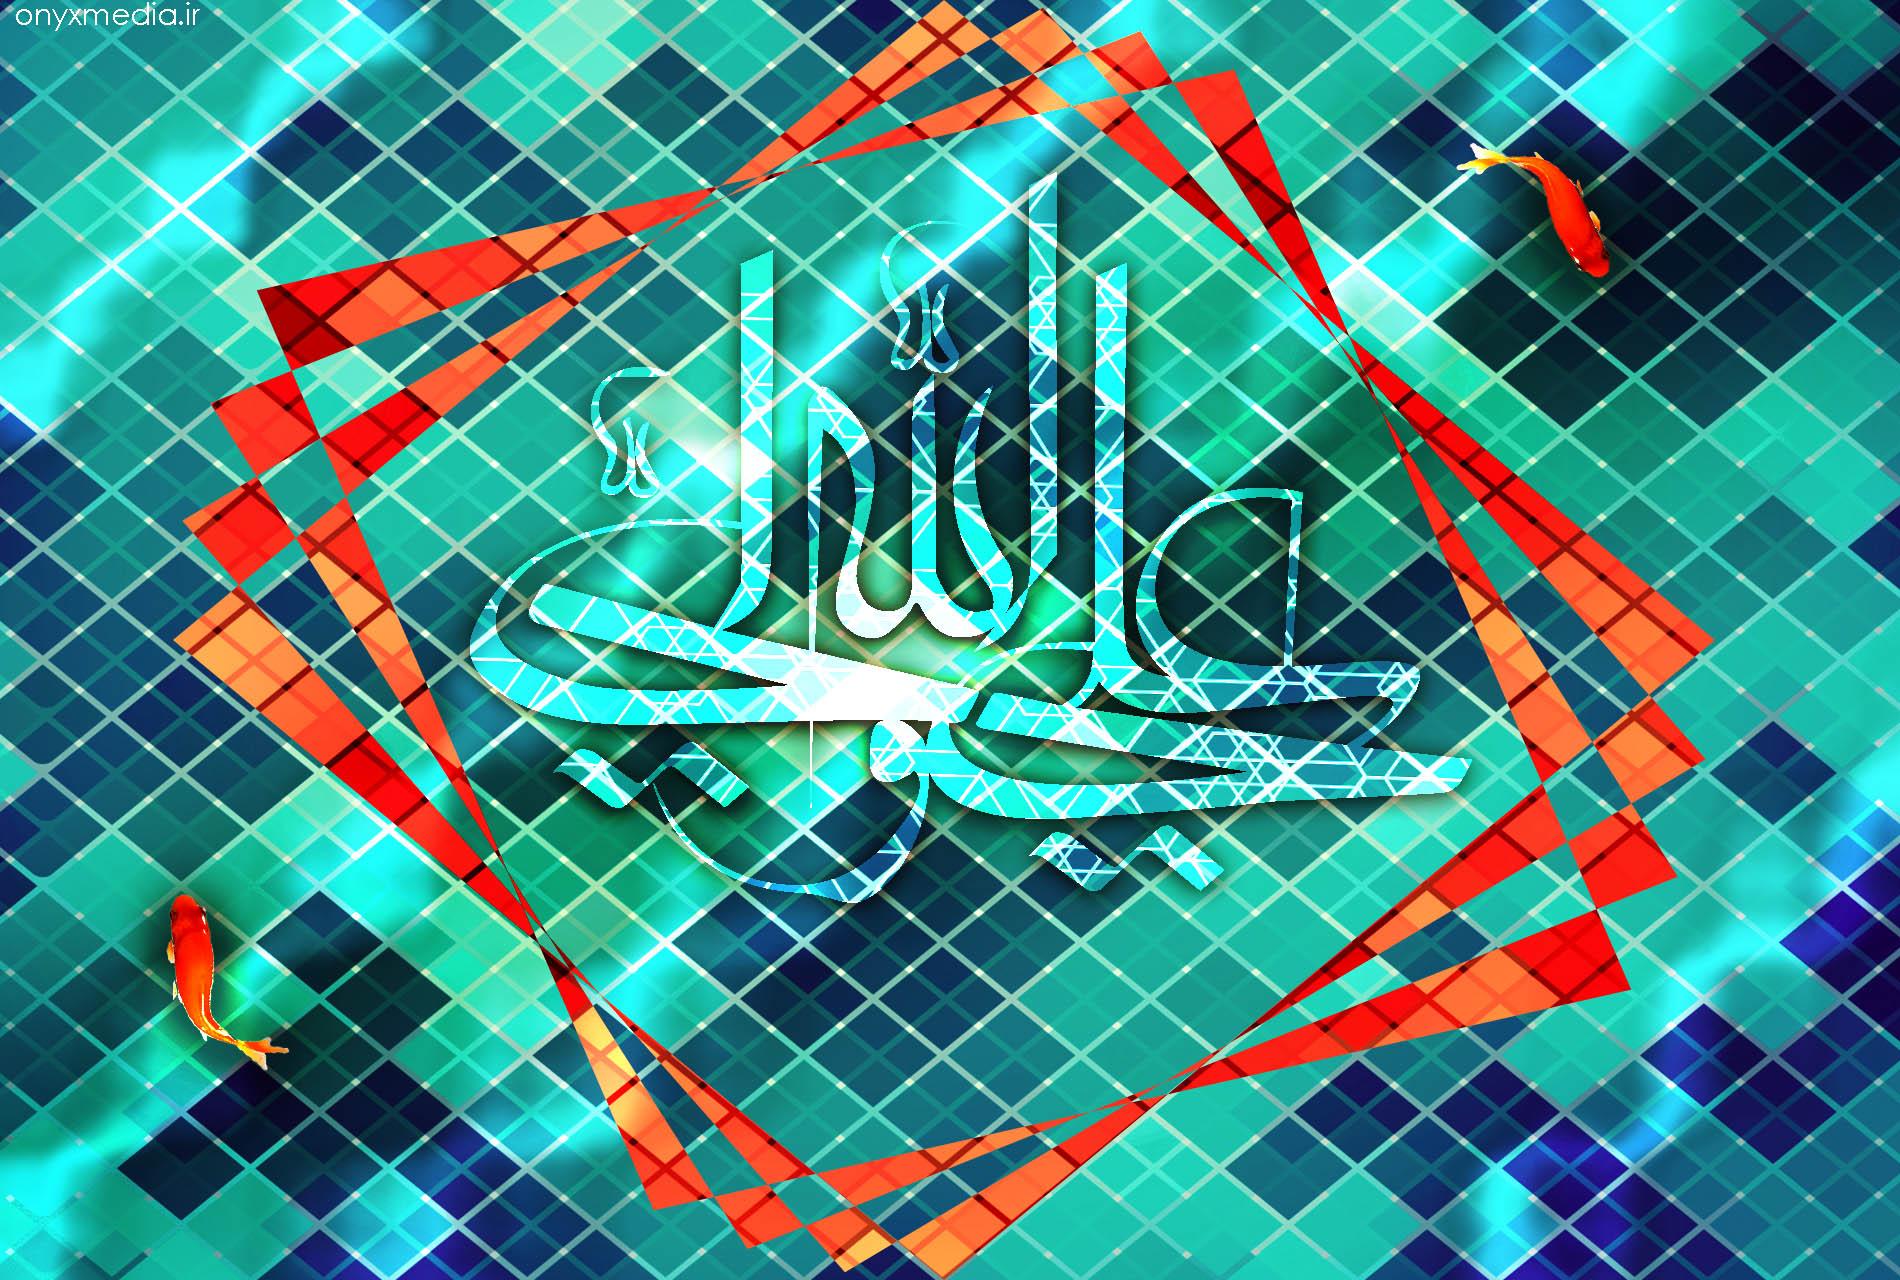 پوستر علی ولی الله شماره دو